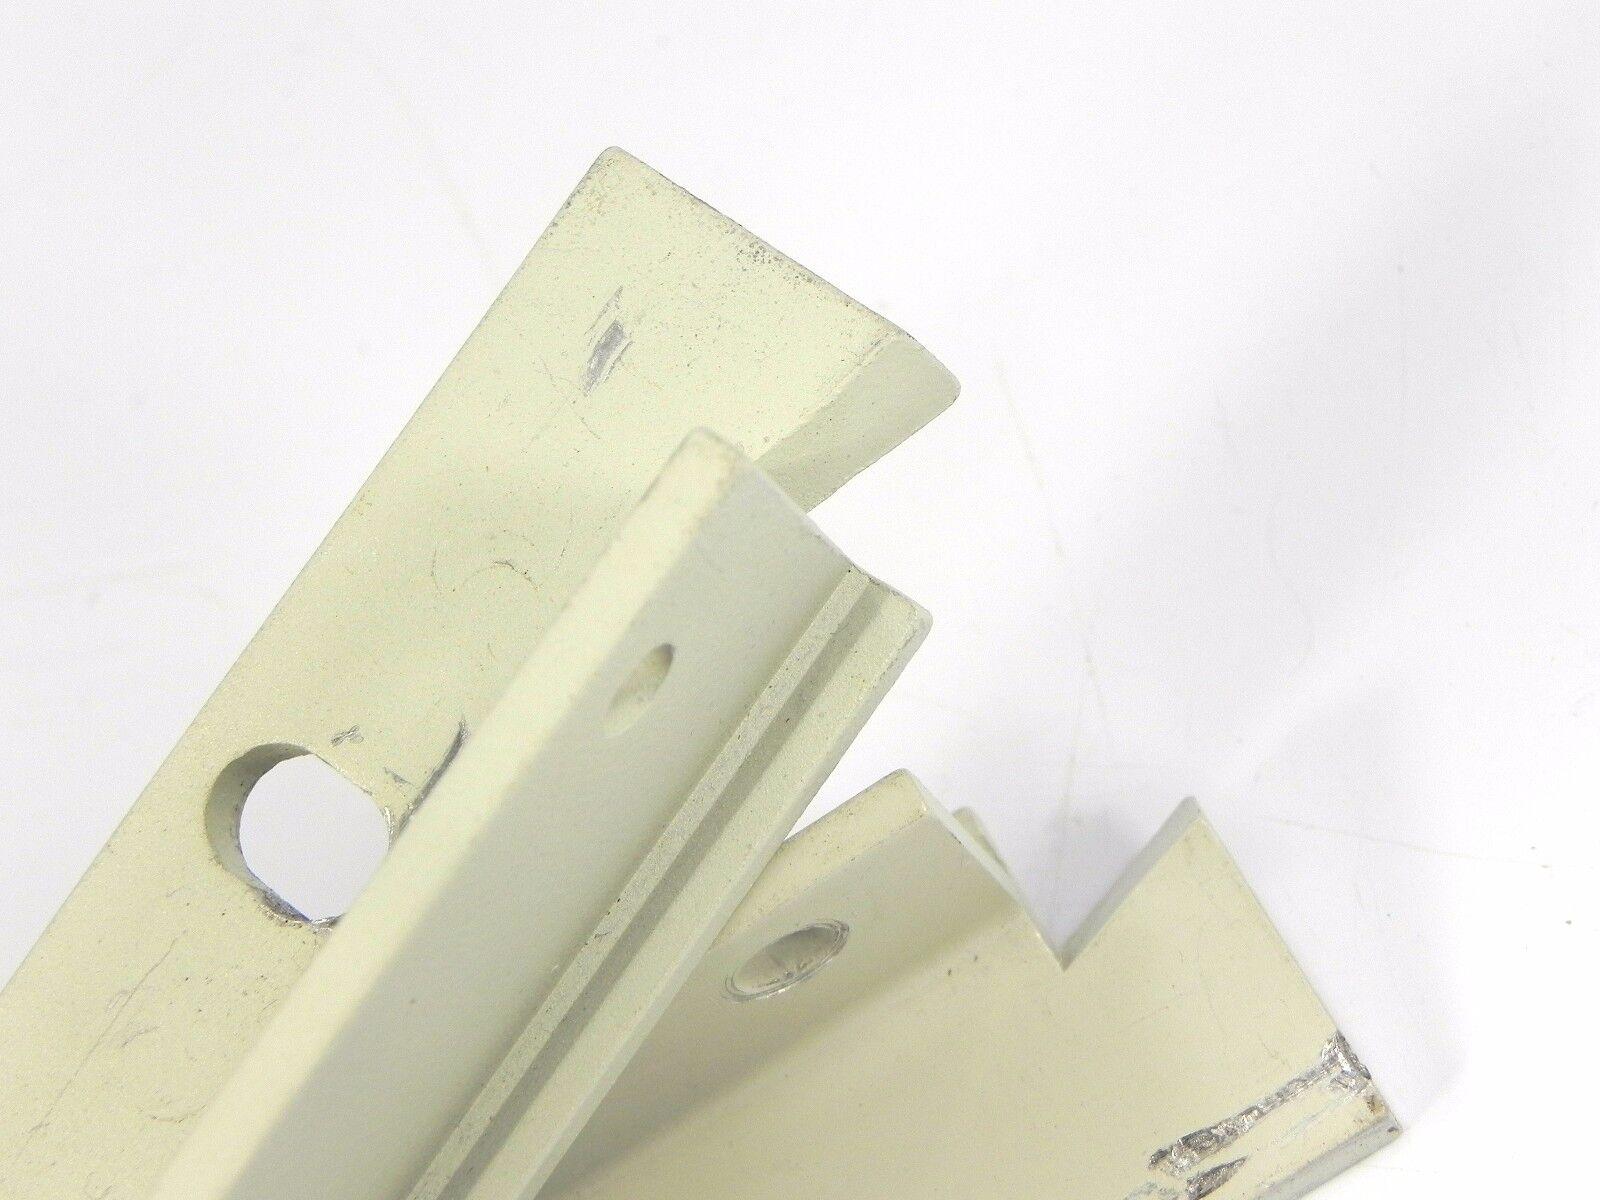 3U Agilent HP Keysight 5062-4071 Rack Mount Flange for units with Handles